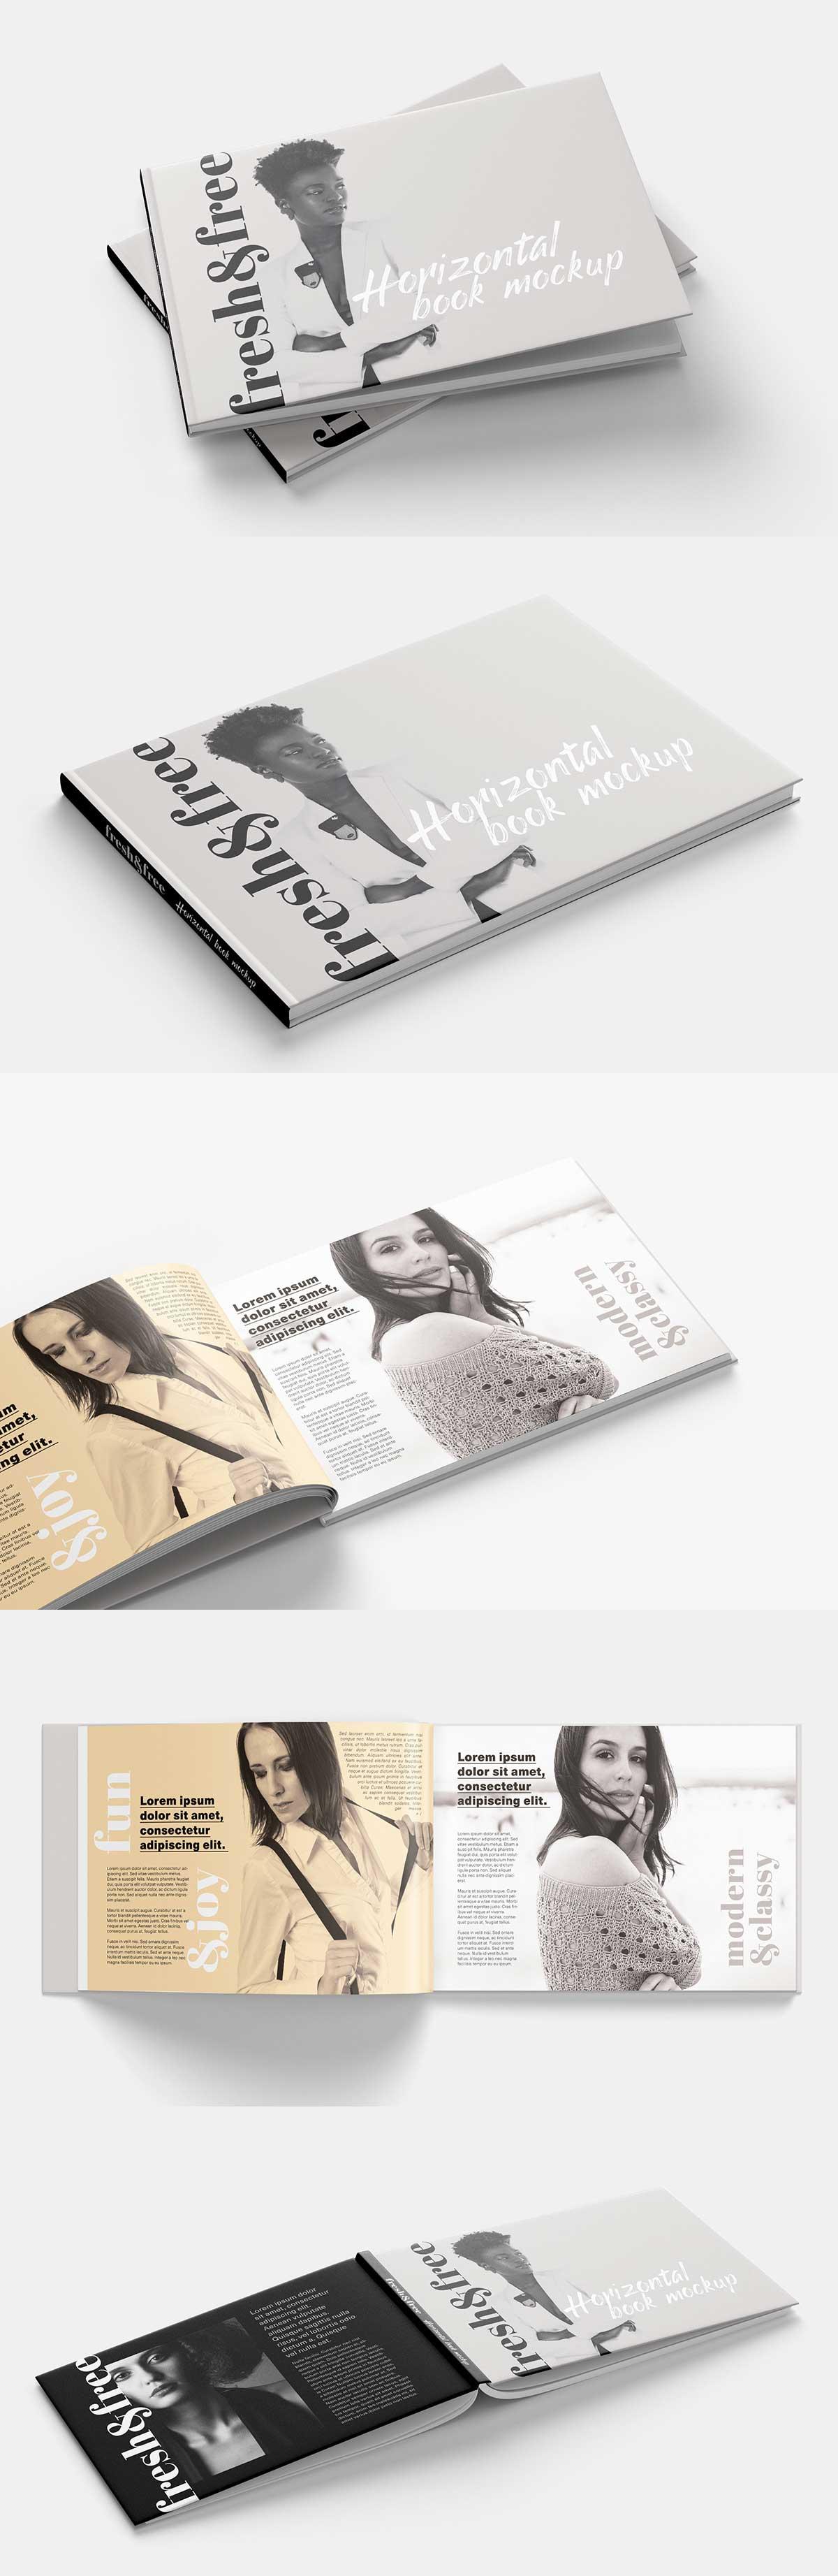 Free-Landscape-Book-Mockup-PSD